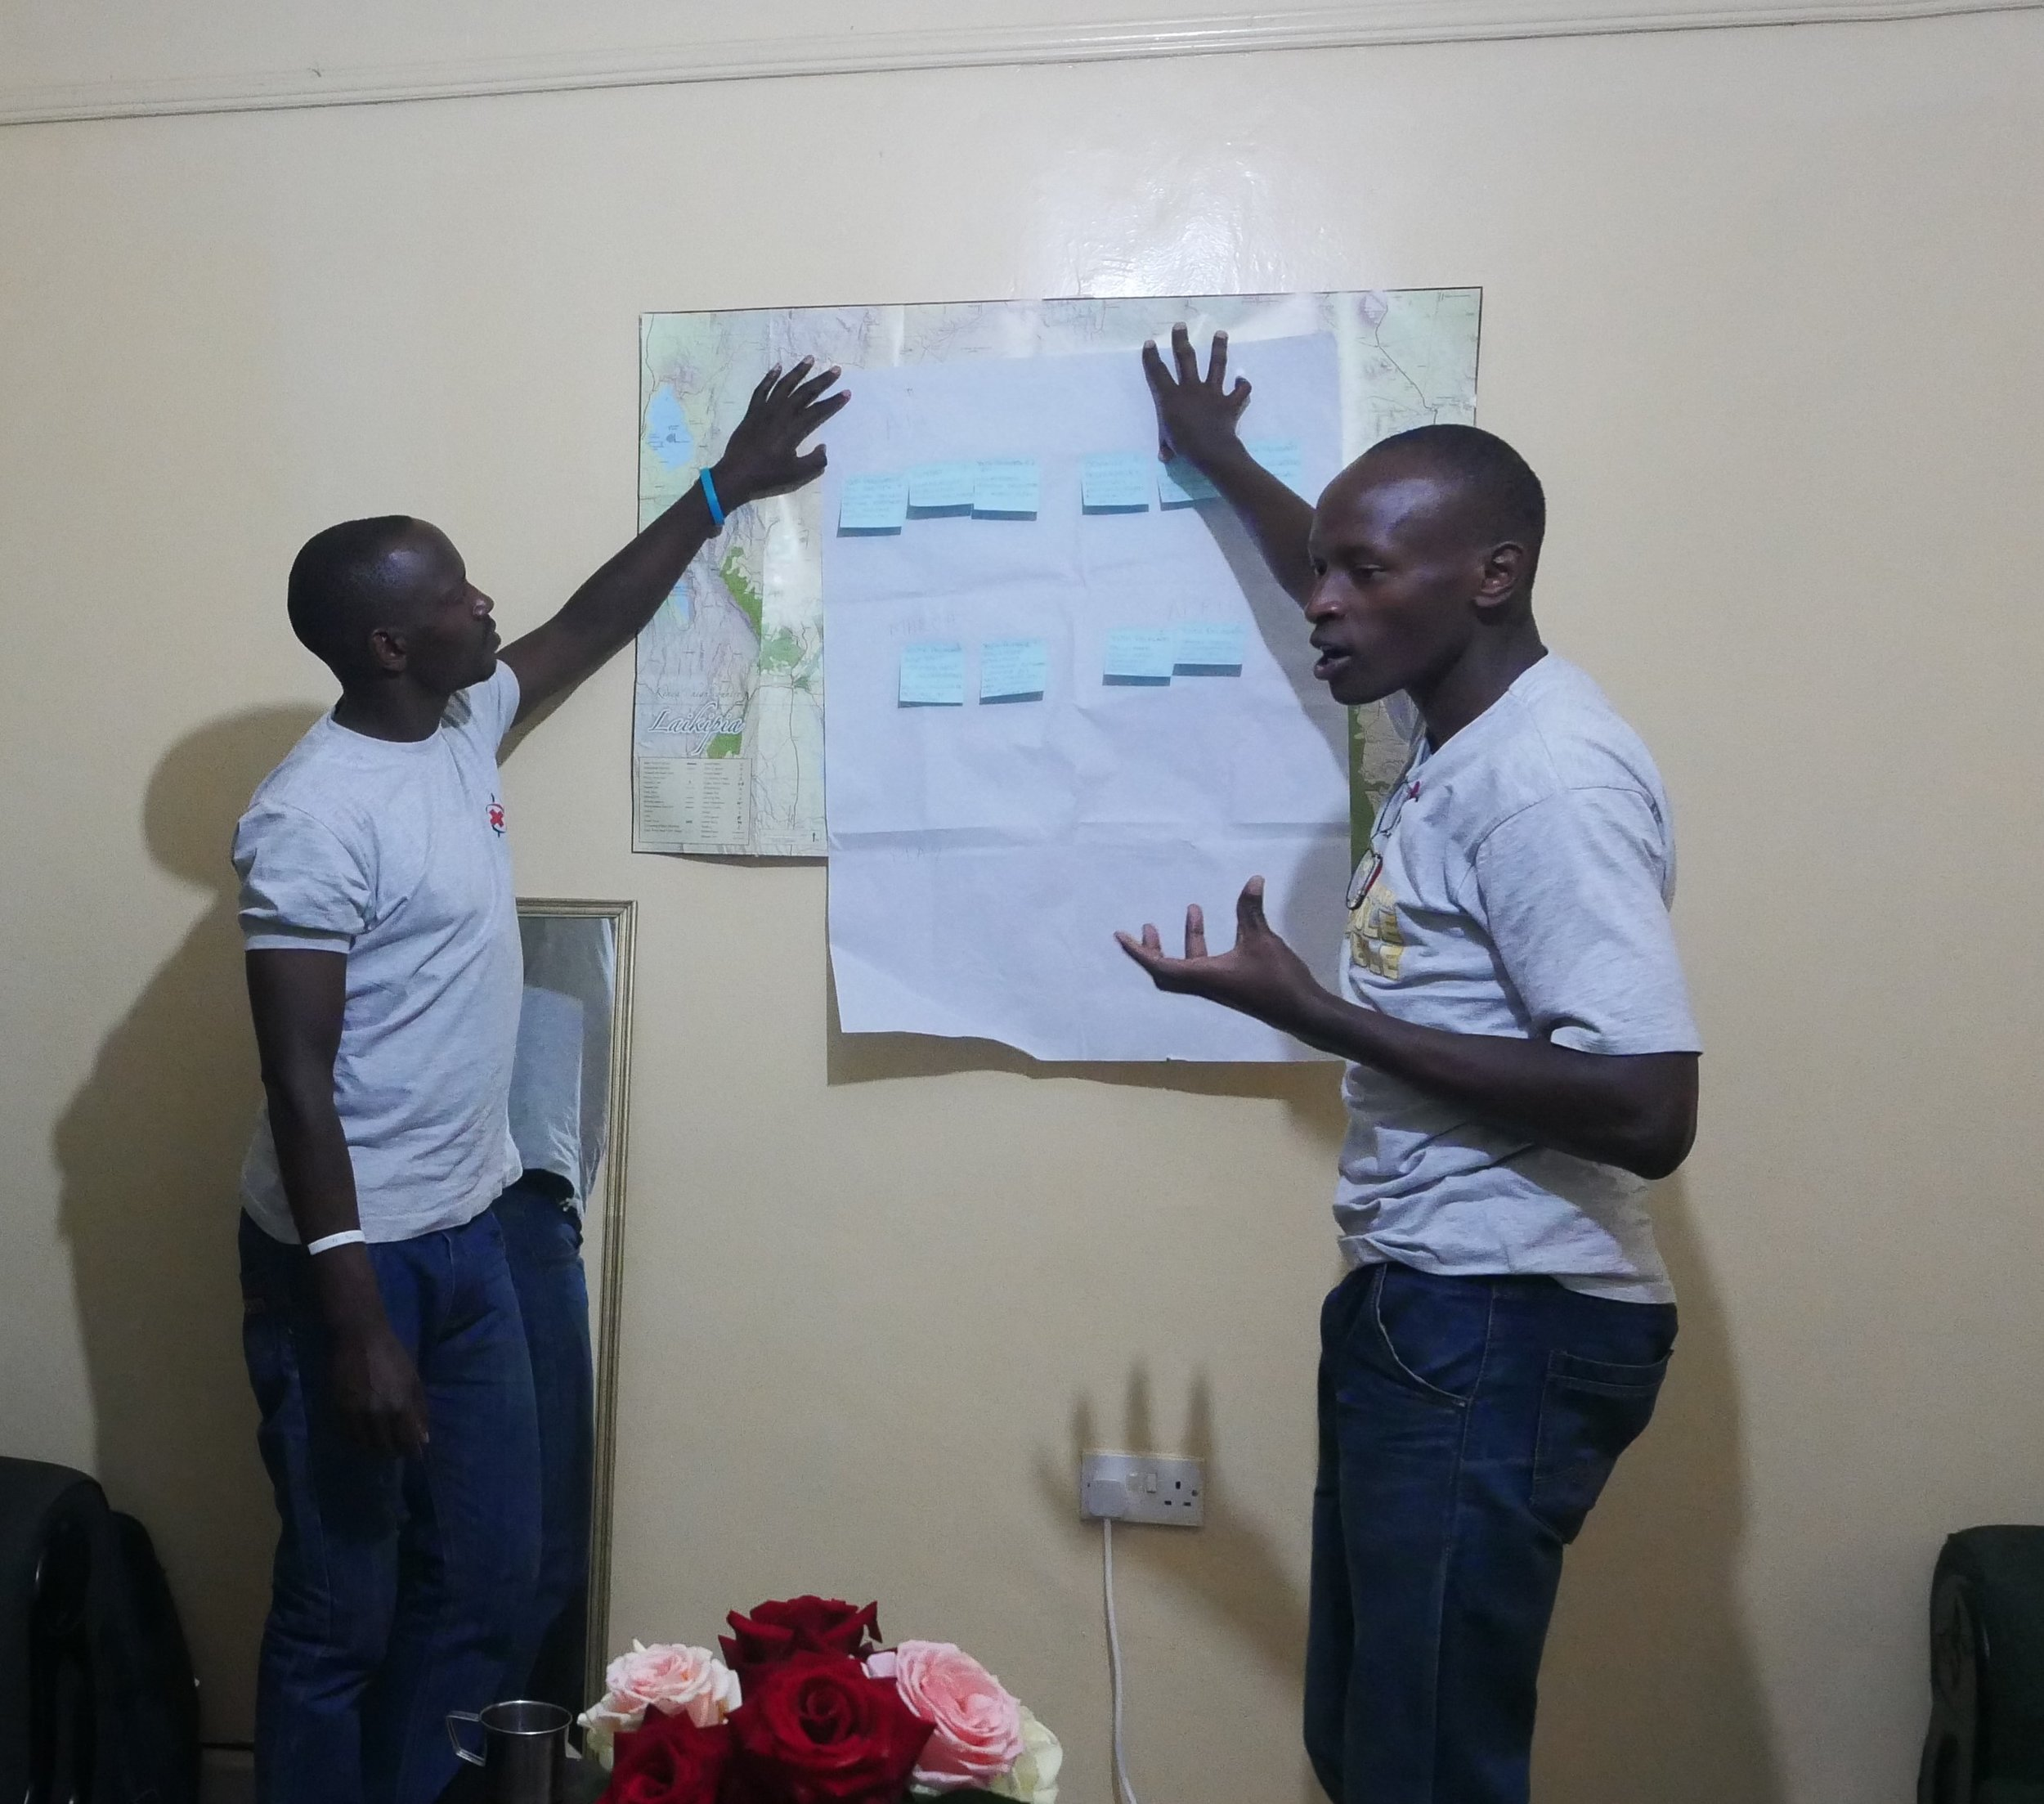 Youth Chair Amos Koech and BYC member Edwin Kagiri present their ideas to the group. Photo: Elfi Thrane Bemelmans.